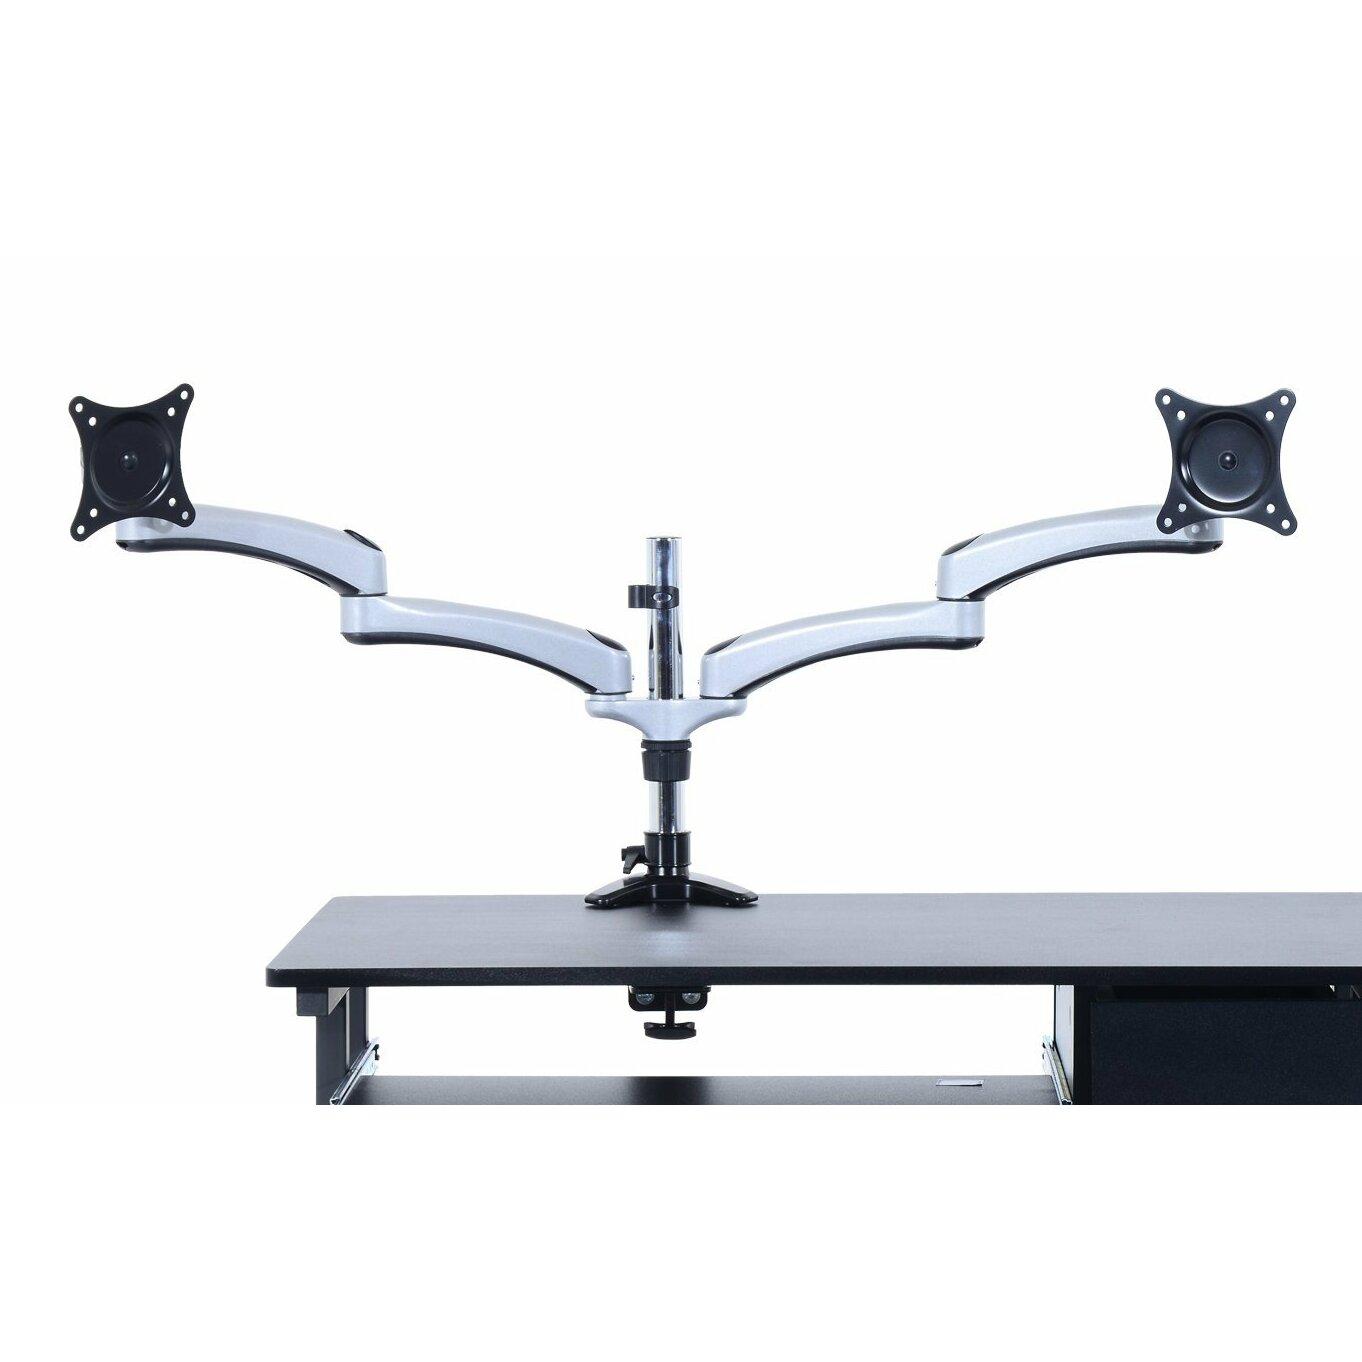 Homcom Dual Twin LEDLCDTV Tilting Arm Table Mount  : Homcom Dual Twin LED LCD TV Tilting Arm Table Mount Bracket Computer Monitor Stand for 15 27 Flat Panel Screens from www.wayfair.co.uk size 1362 x 1362 jpeg 100kB